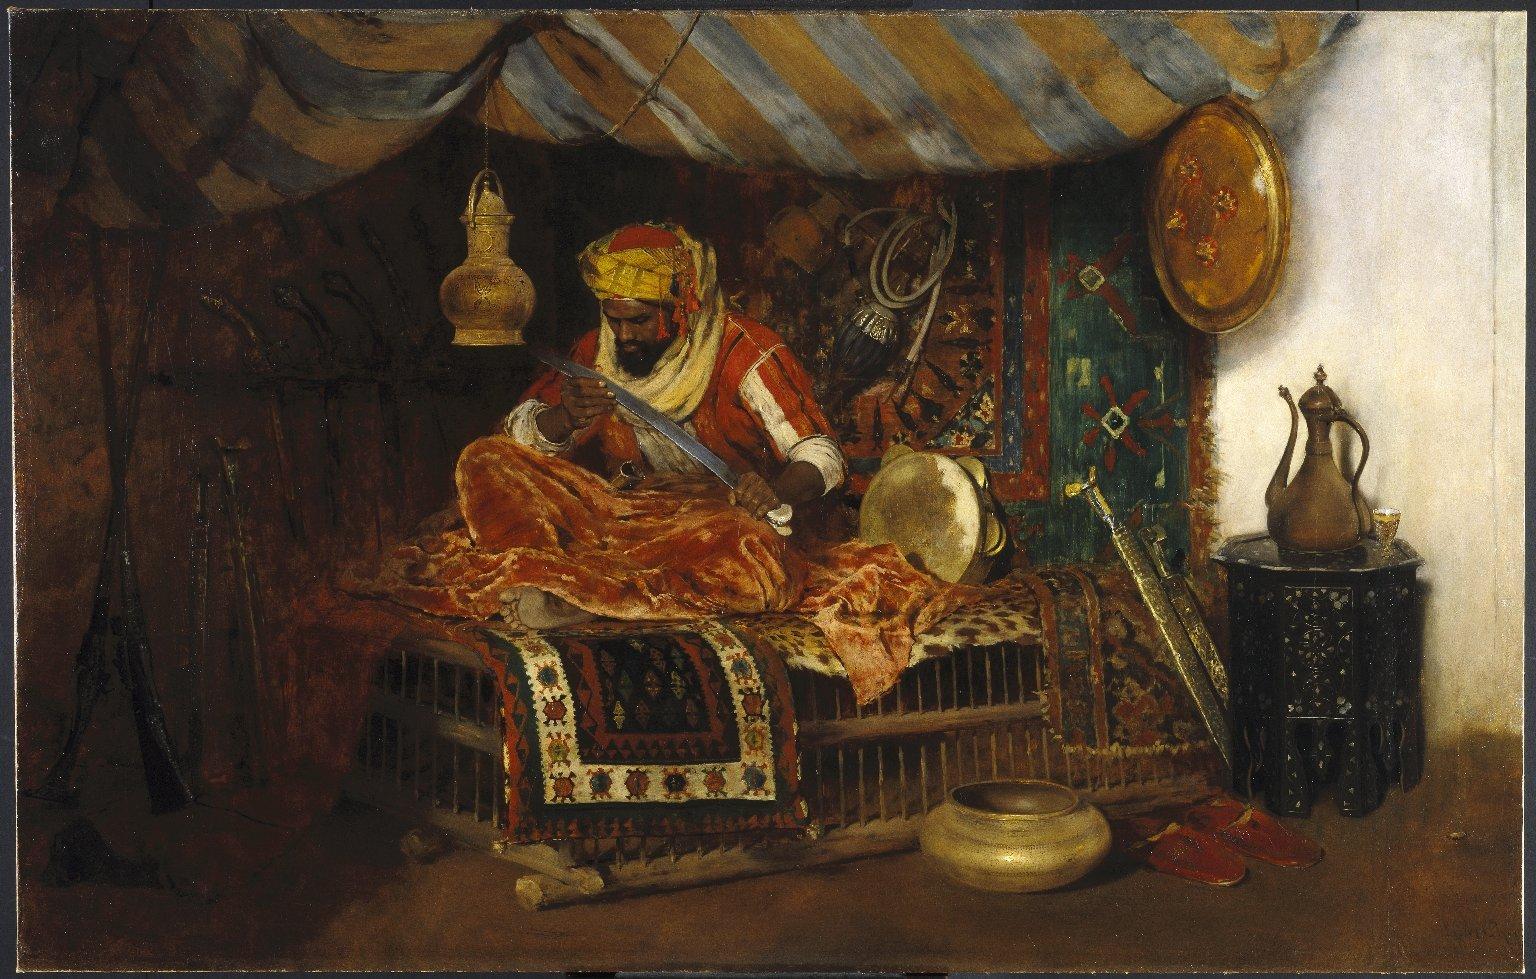 Moulay Ismāʿīl, sultan des Marocains